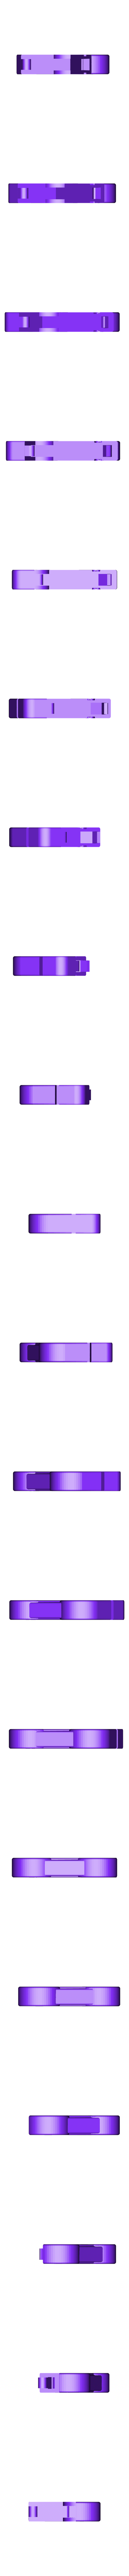 PipBoy-2000_-_HoloTape_-_top.stl Download free STL file Fallout HoloTape • 3D print object, ka3ros